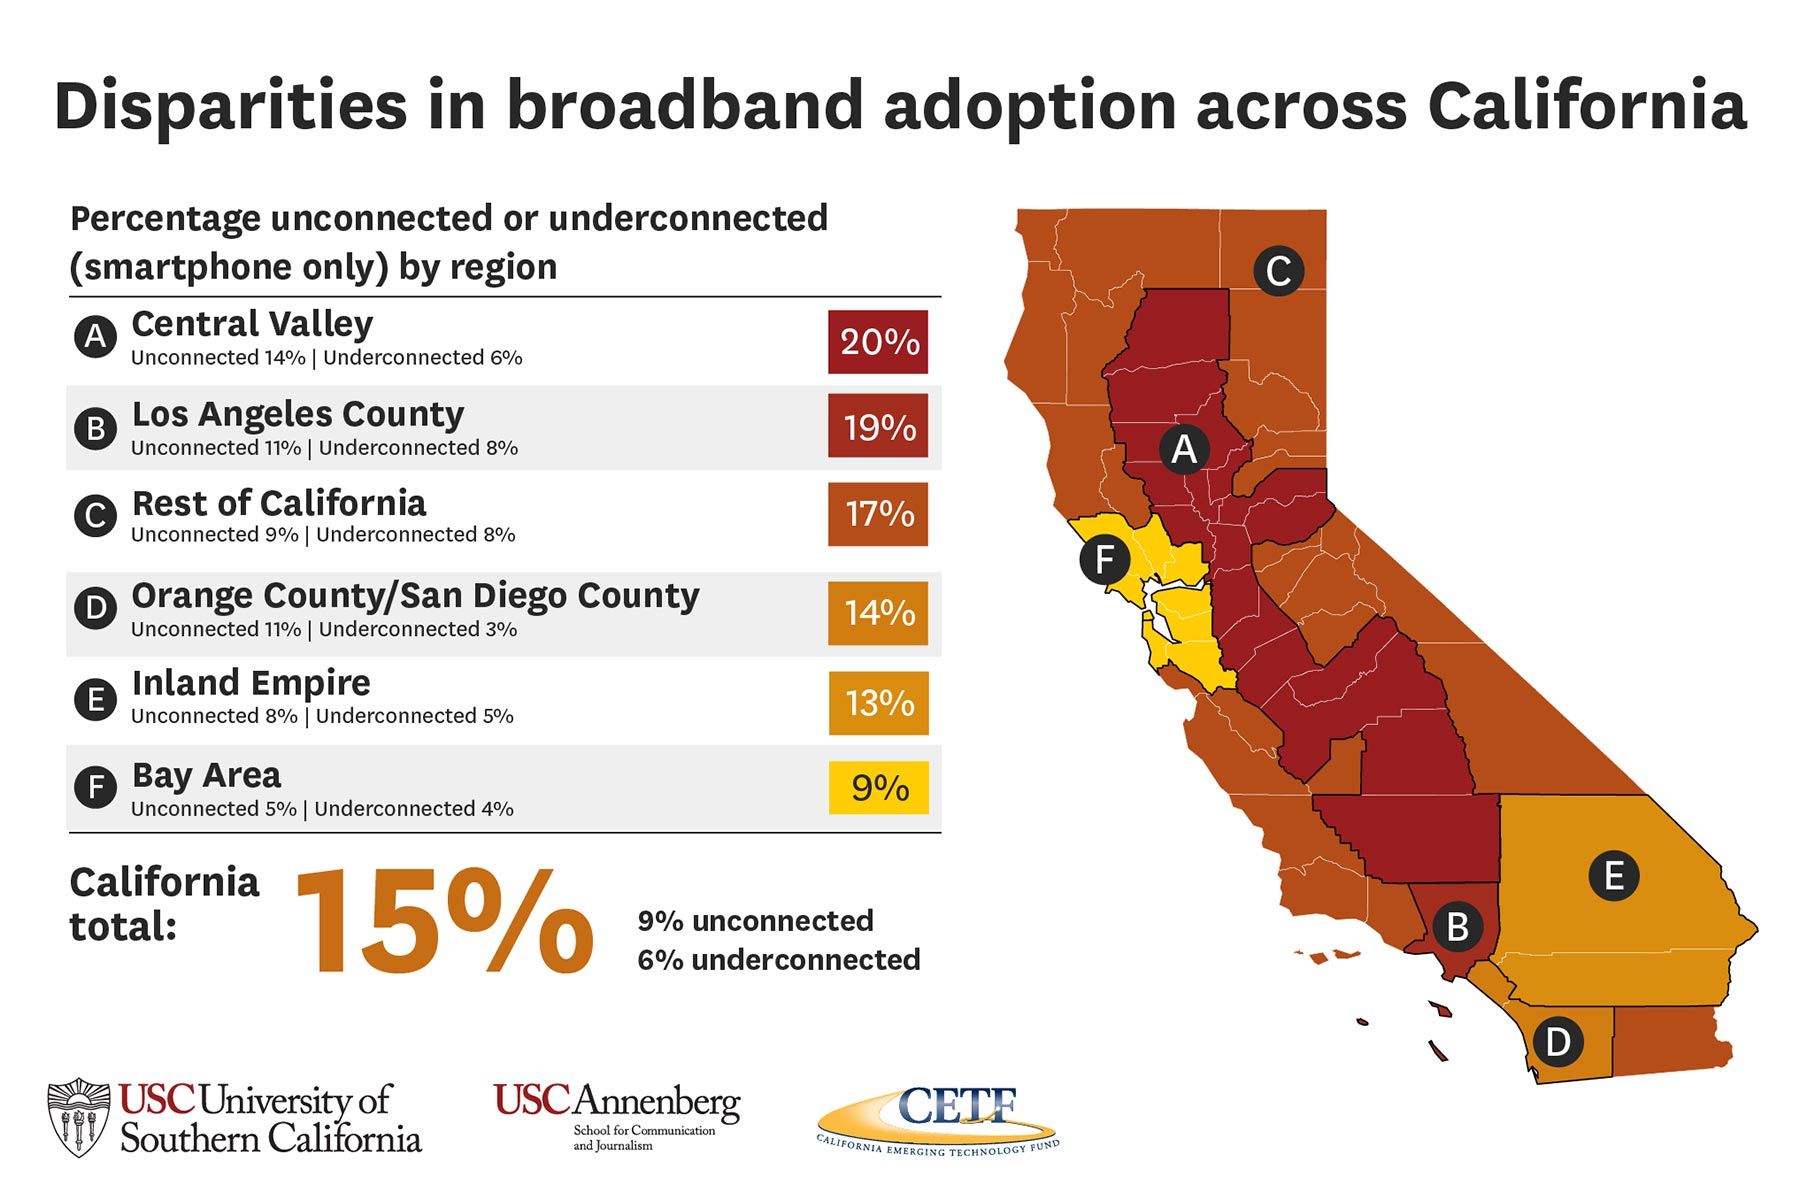 Disparities in broadband adoption across California